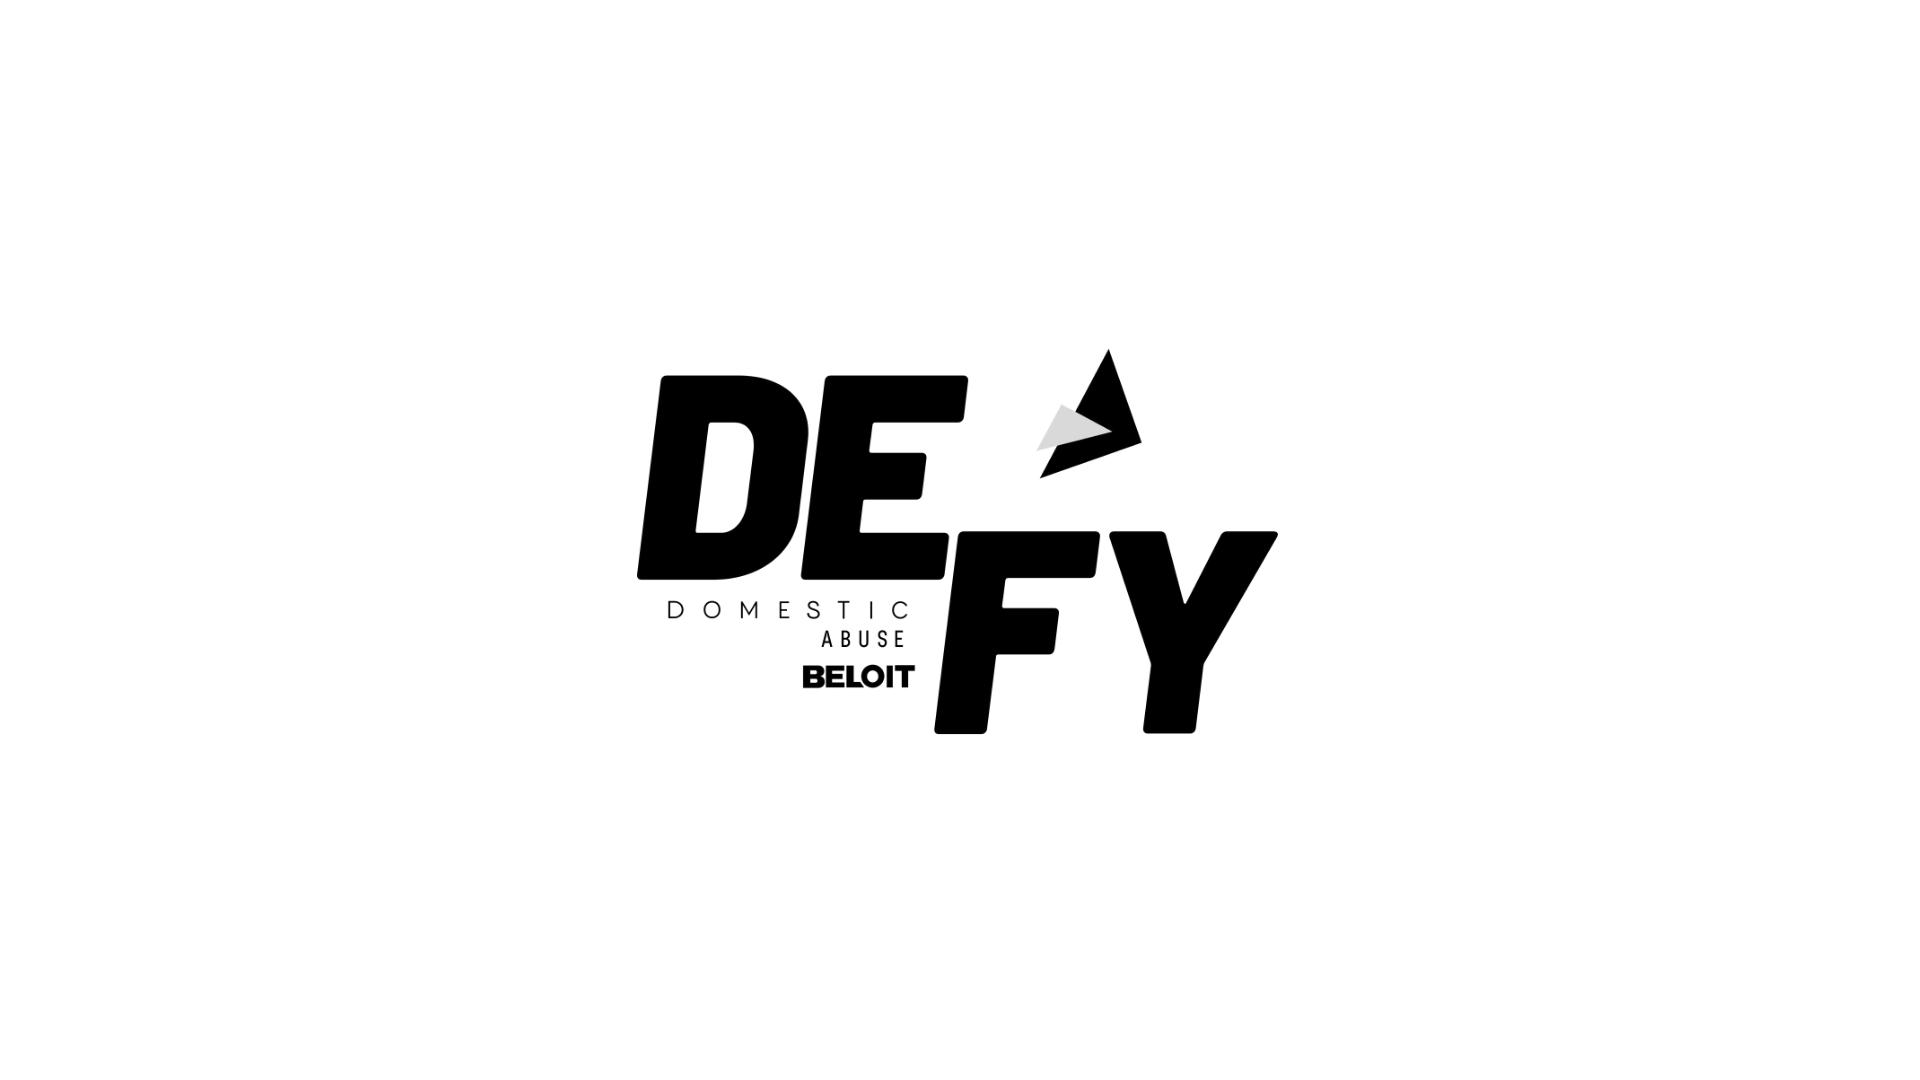 Brand logo created by Owl Street Studio for Defy Domestic Abuse Beloit